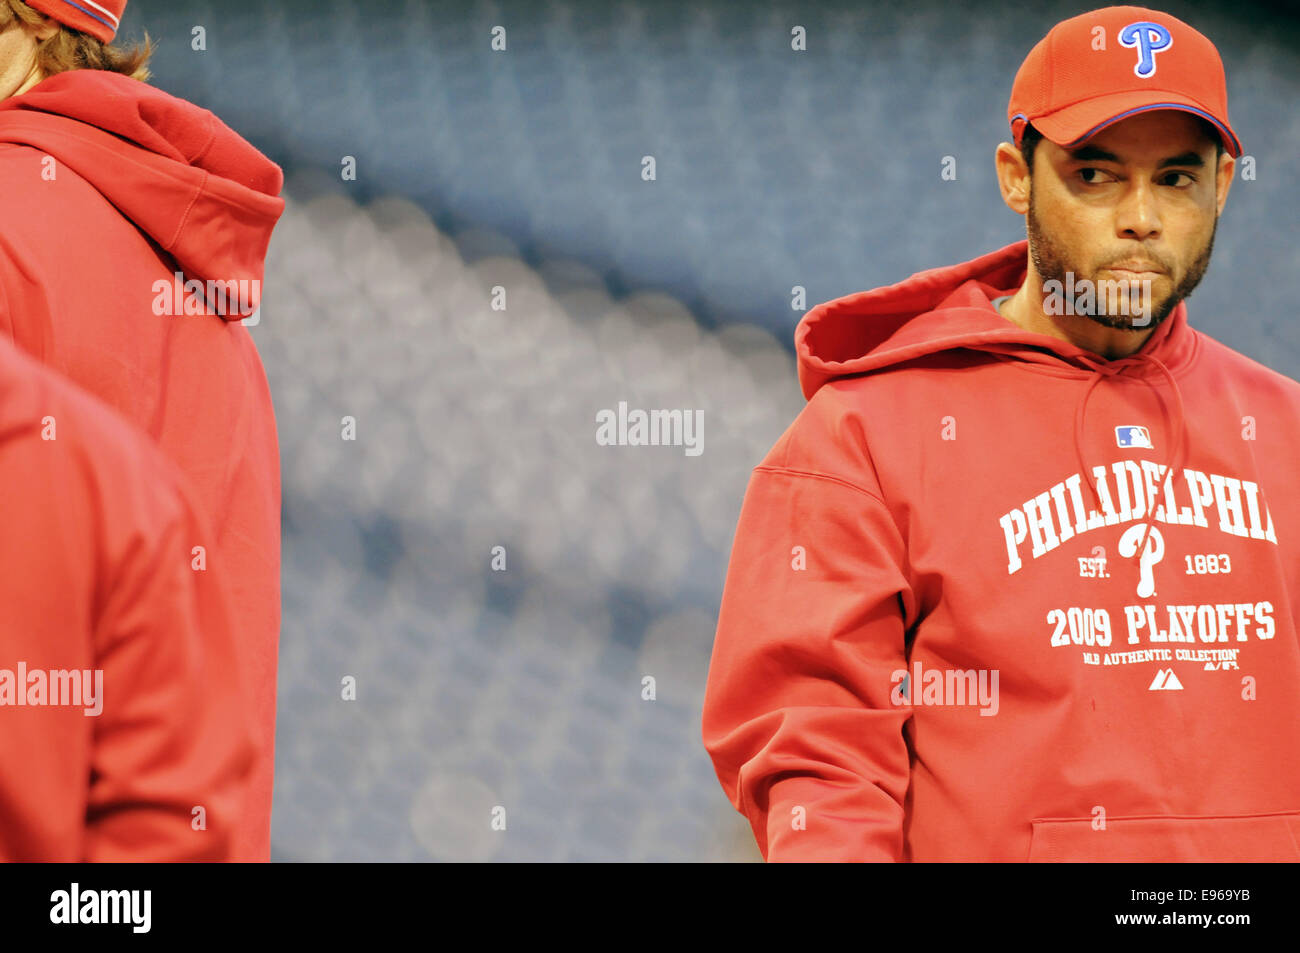 Philadelphia Phillies Pedro Julio feliz furing práctica durante 2008 Temporada de playoffs en Citizens Bank Imagen De Stock